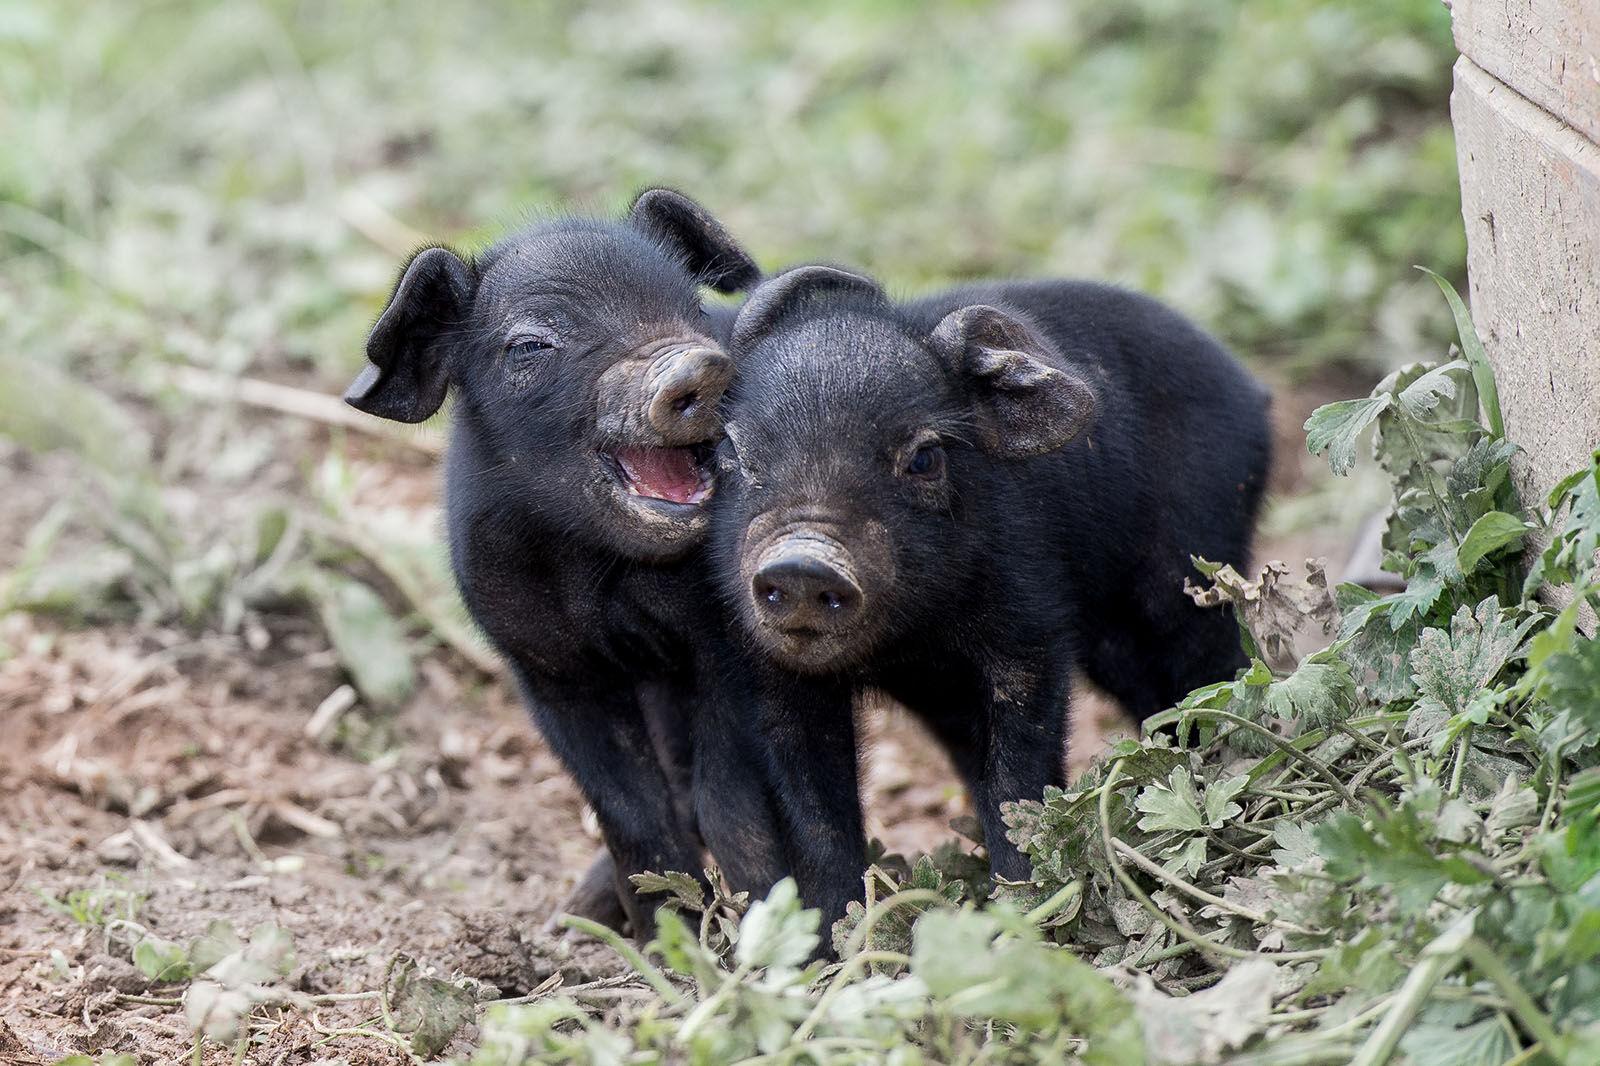 Cornish black piglets.